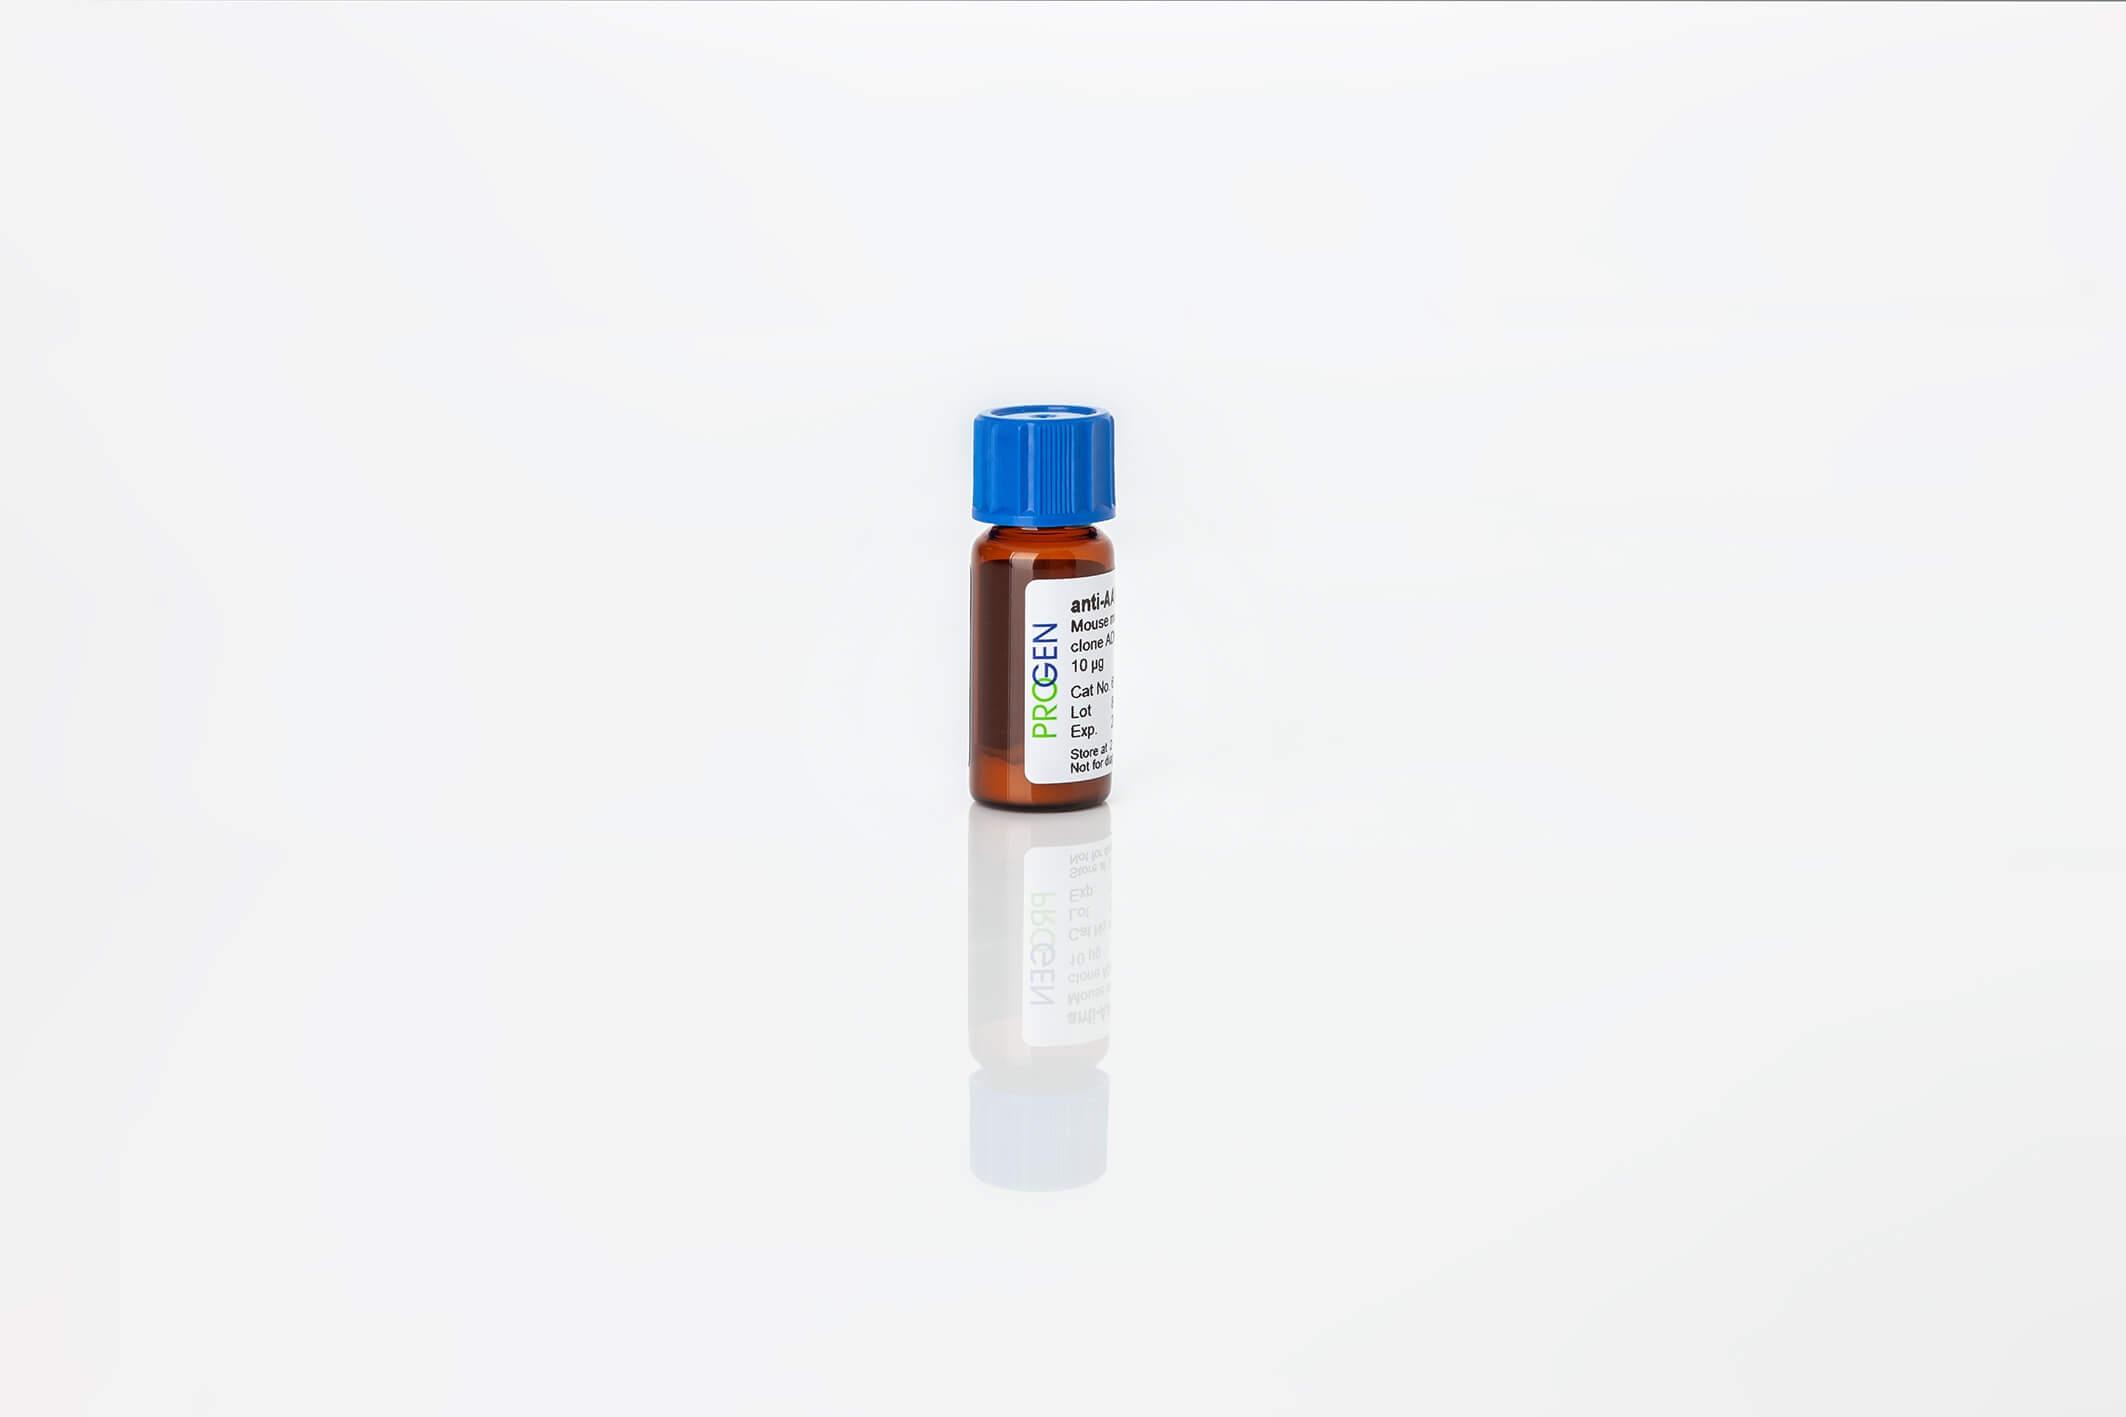 anti-p100 Nuclear Coactivator Protein guinea pig polyclonal, serum